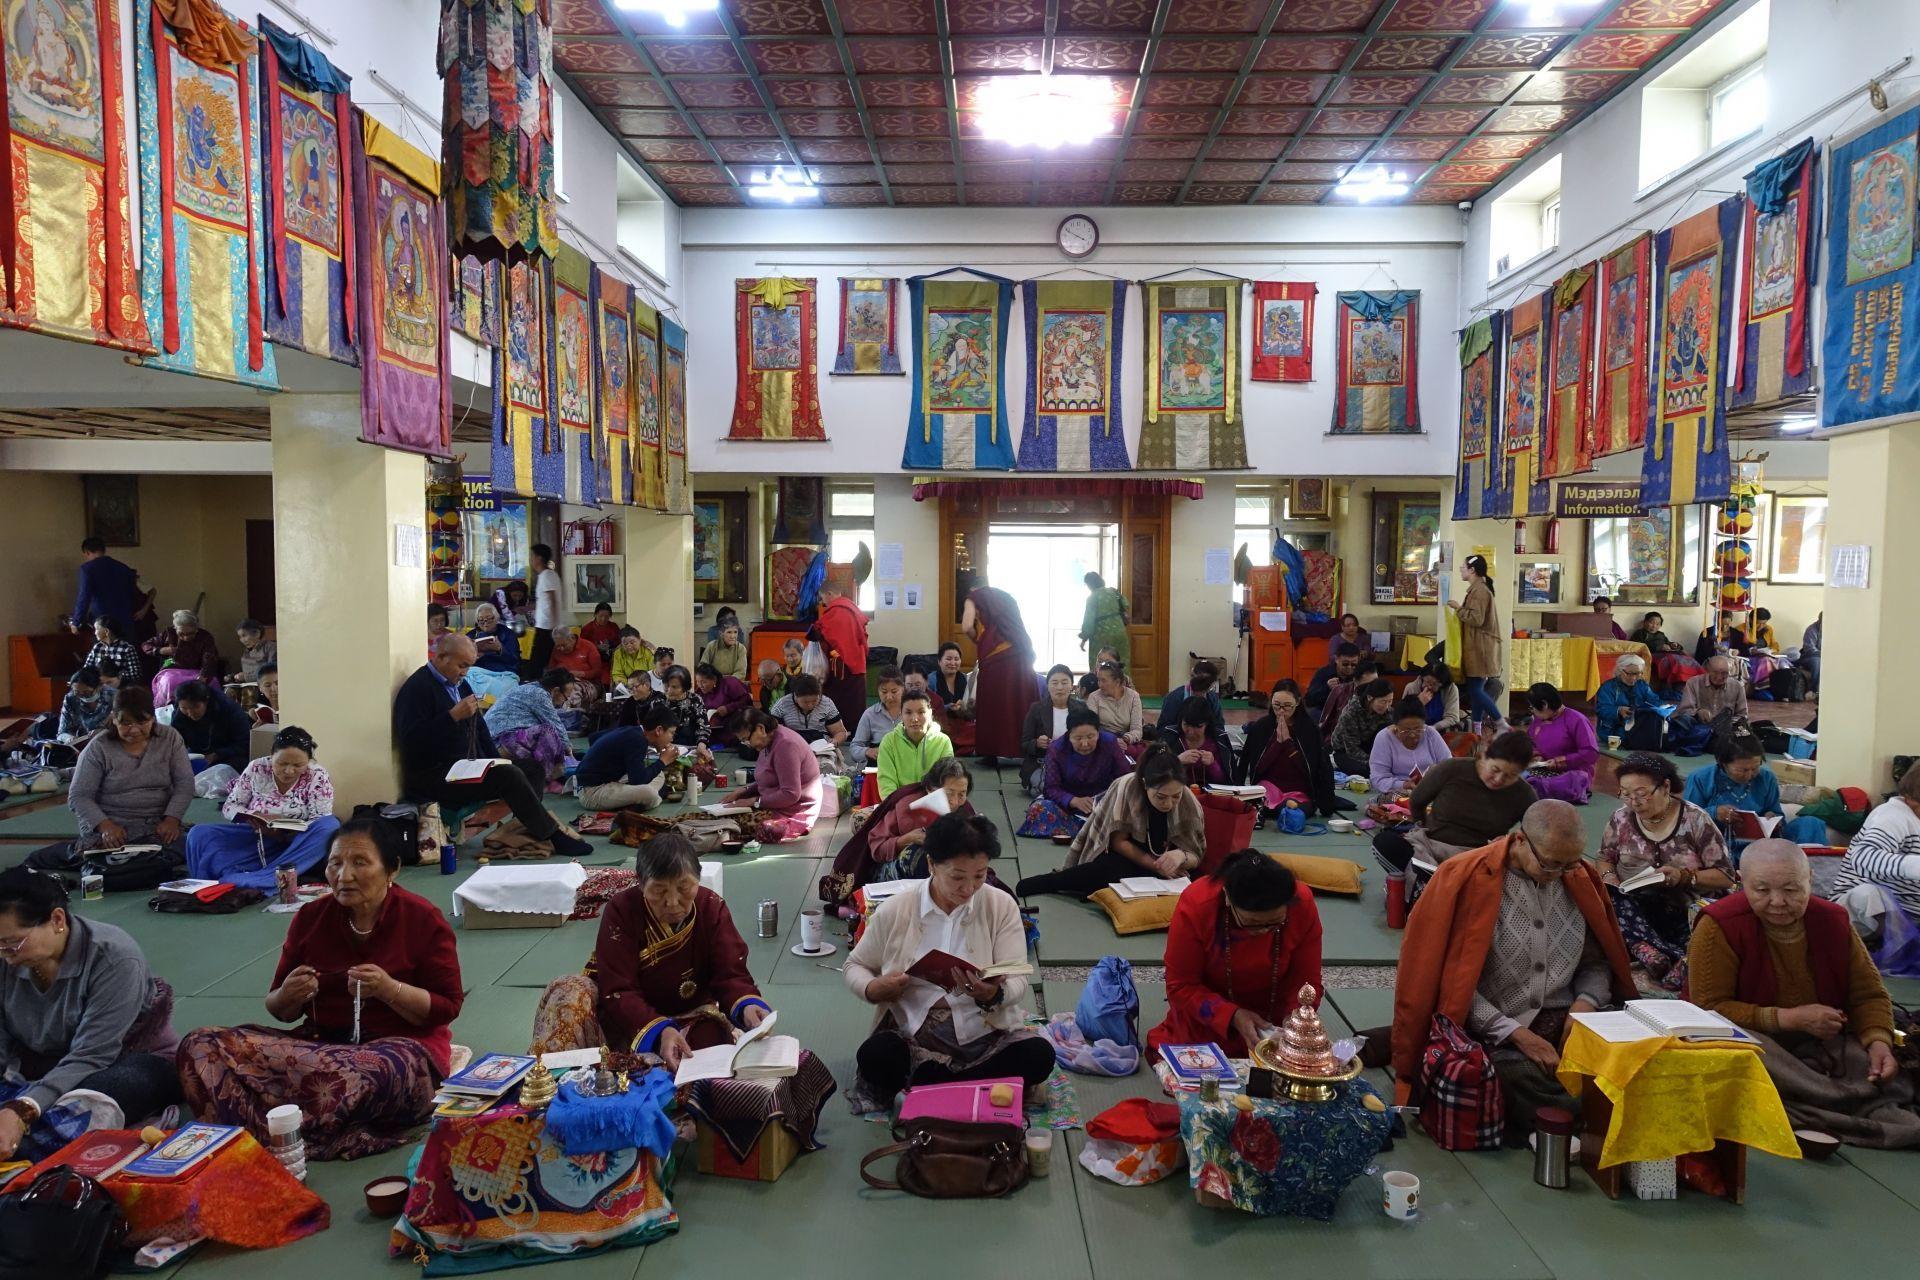 Ganden Do Ngag Shedrup Ling Completed a Seventh 100 Million Mani Retreat